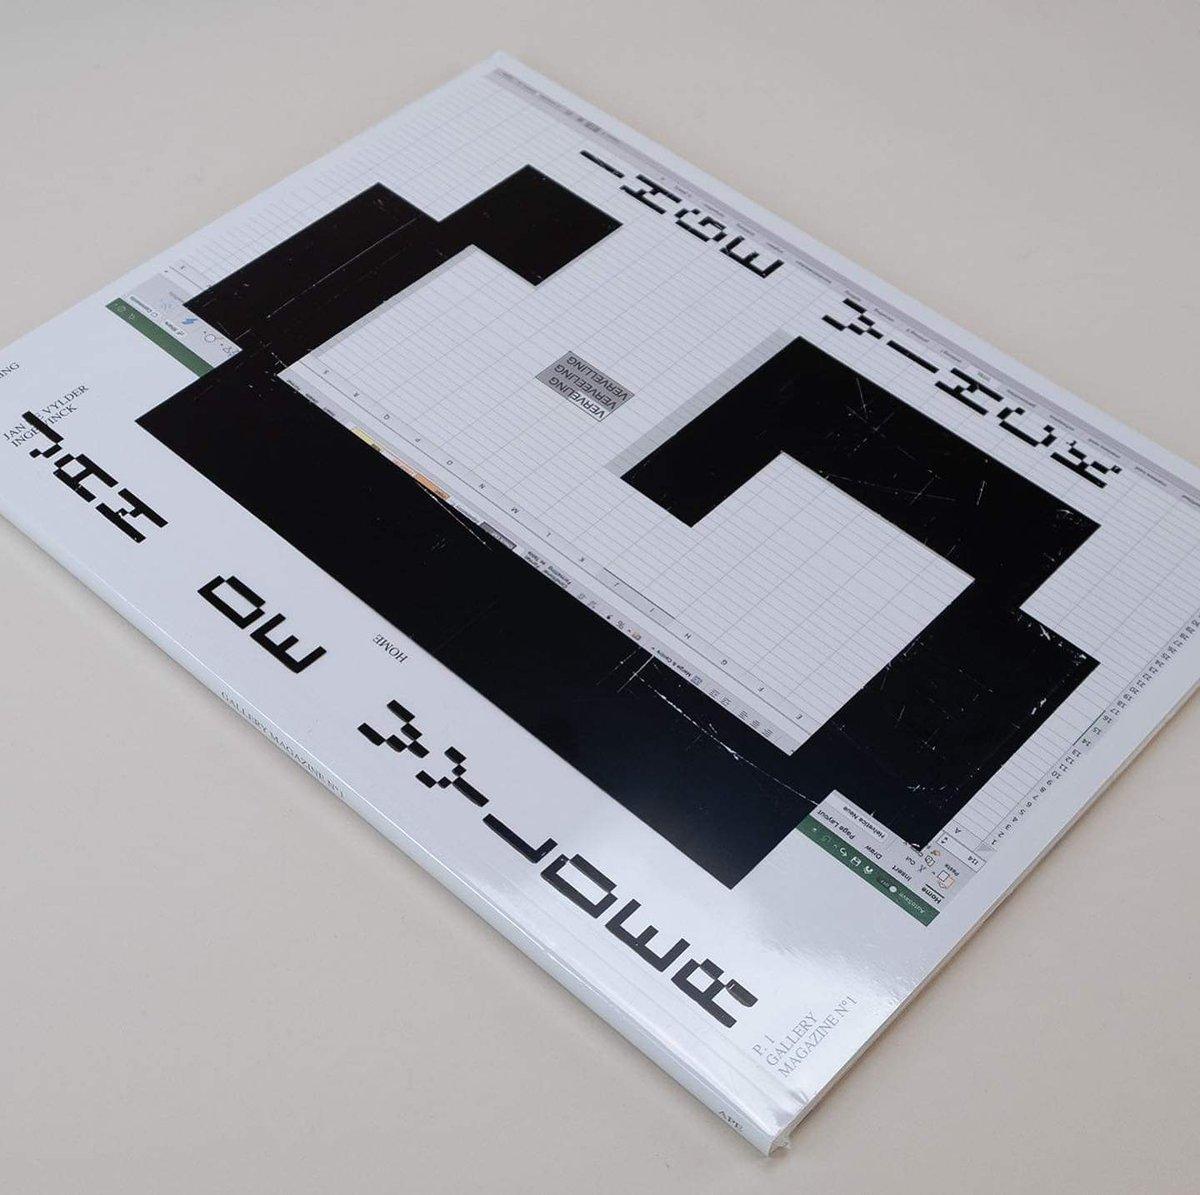 CARROUSEL JOURNEY UNIVERSUM 2 - Flag 23